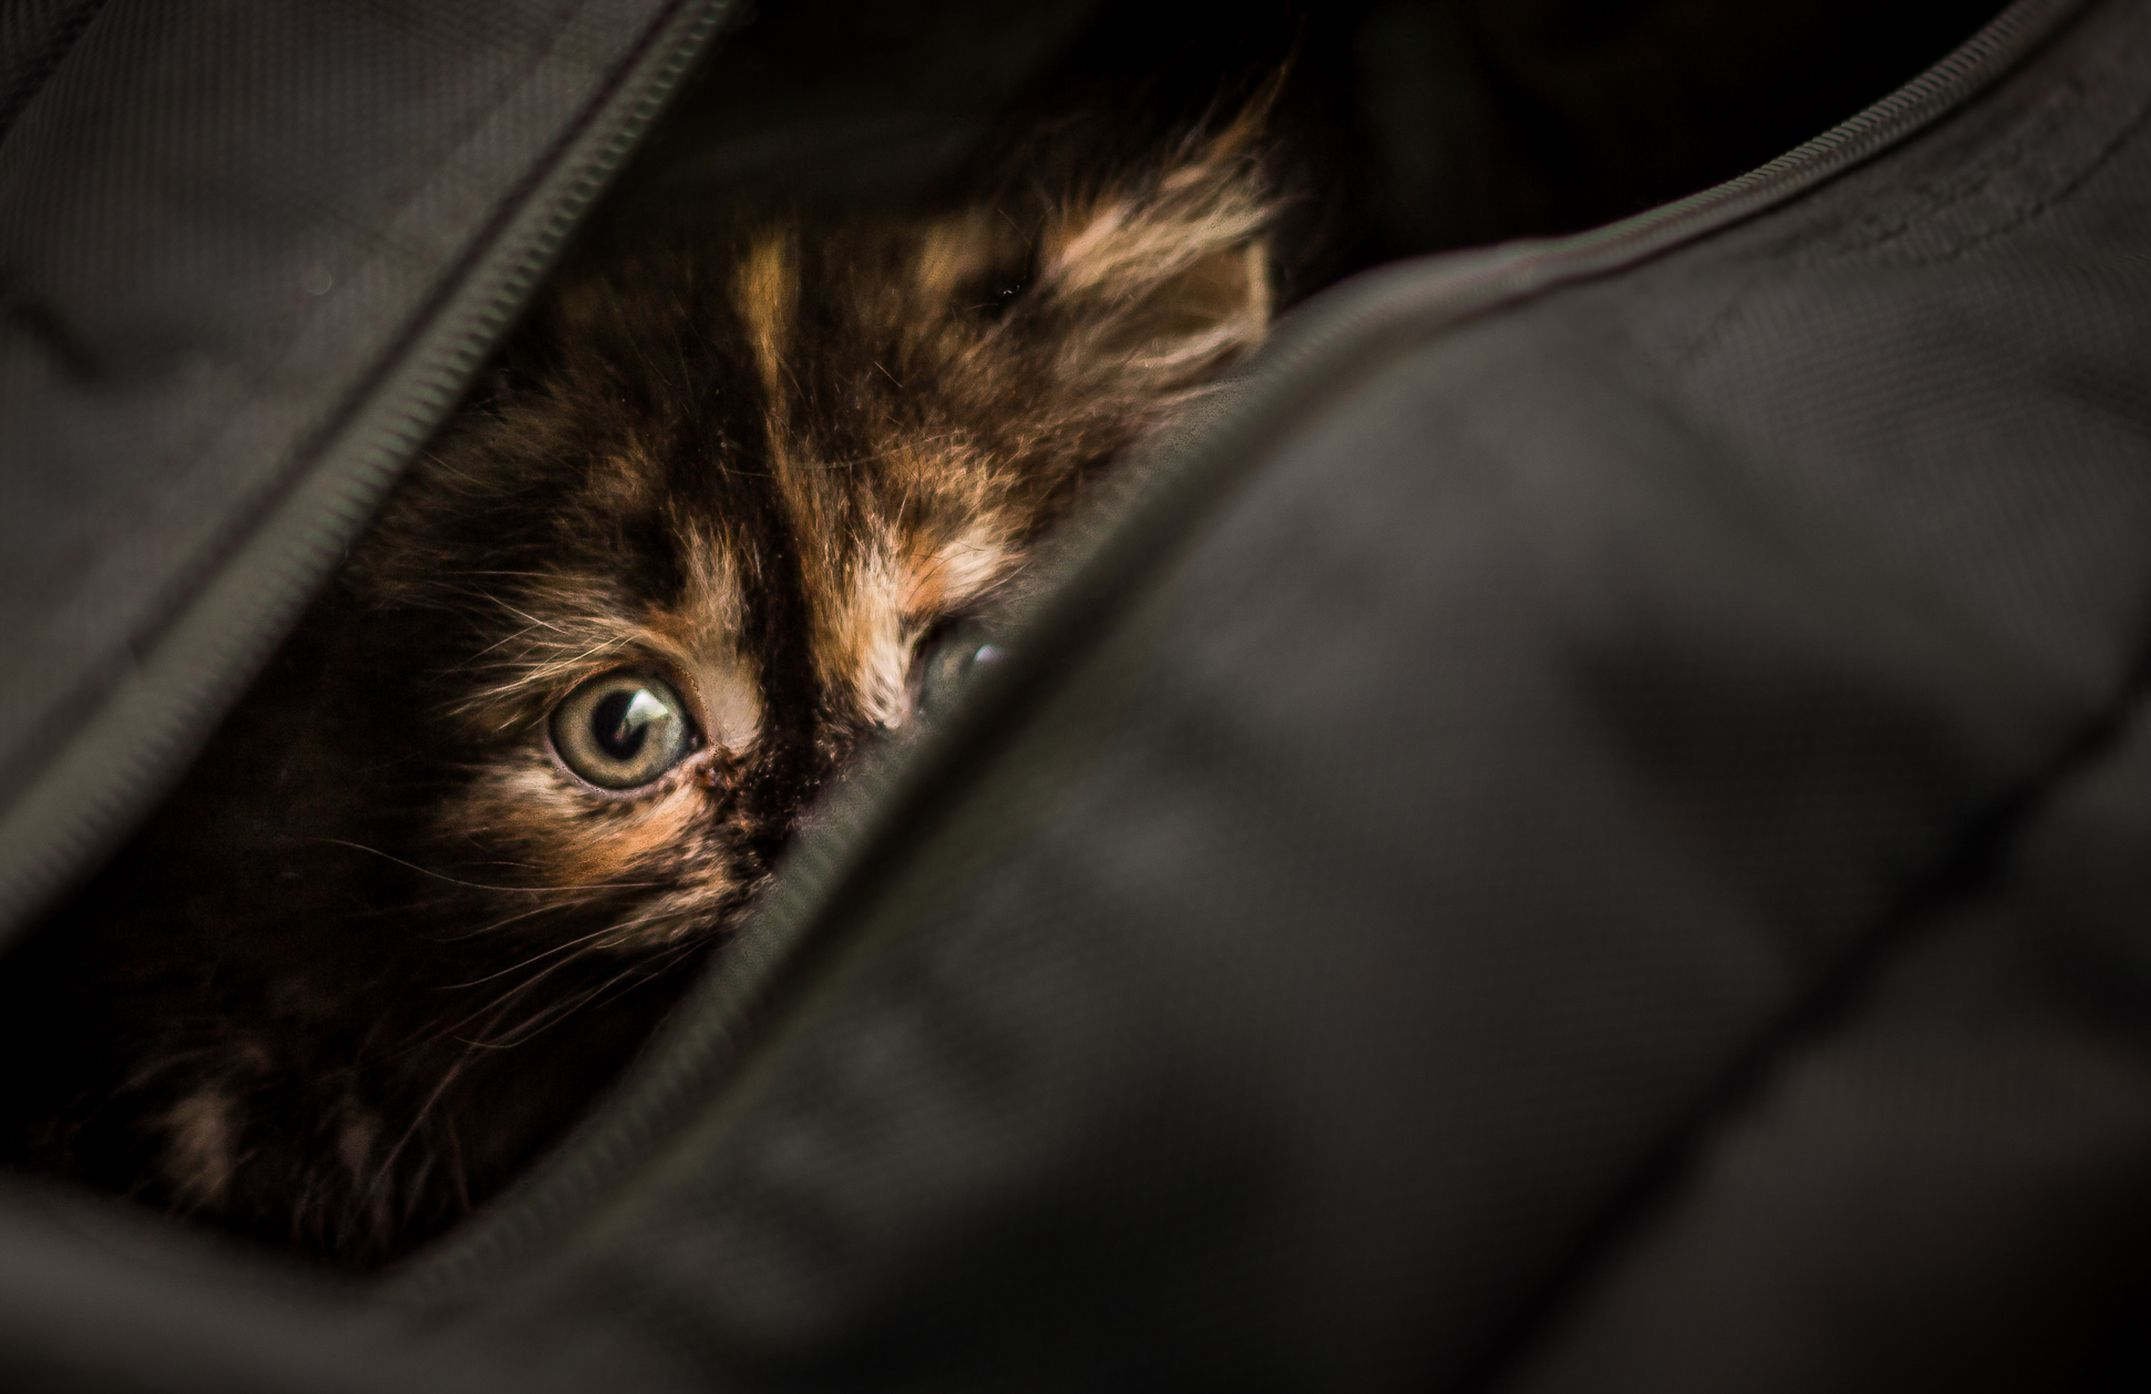 Emergency Preparedness With Pets